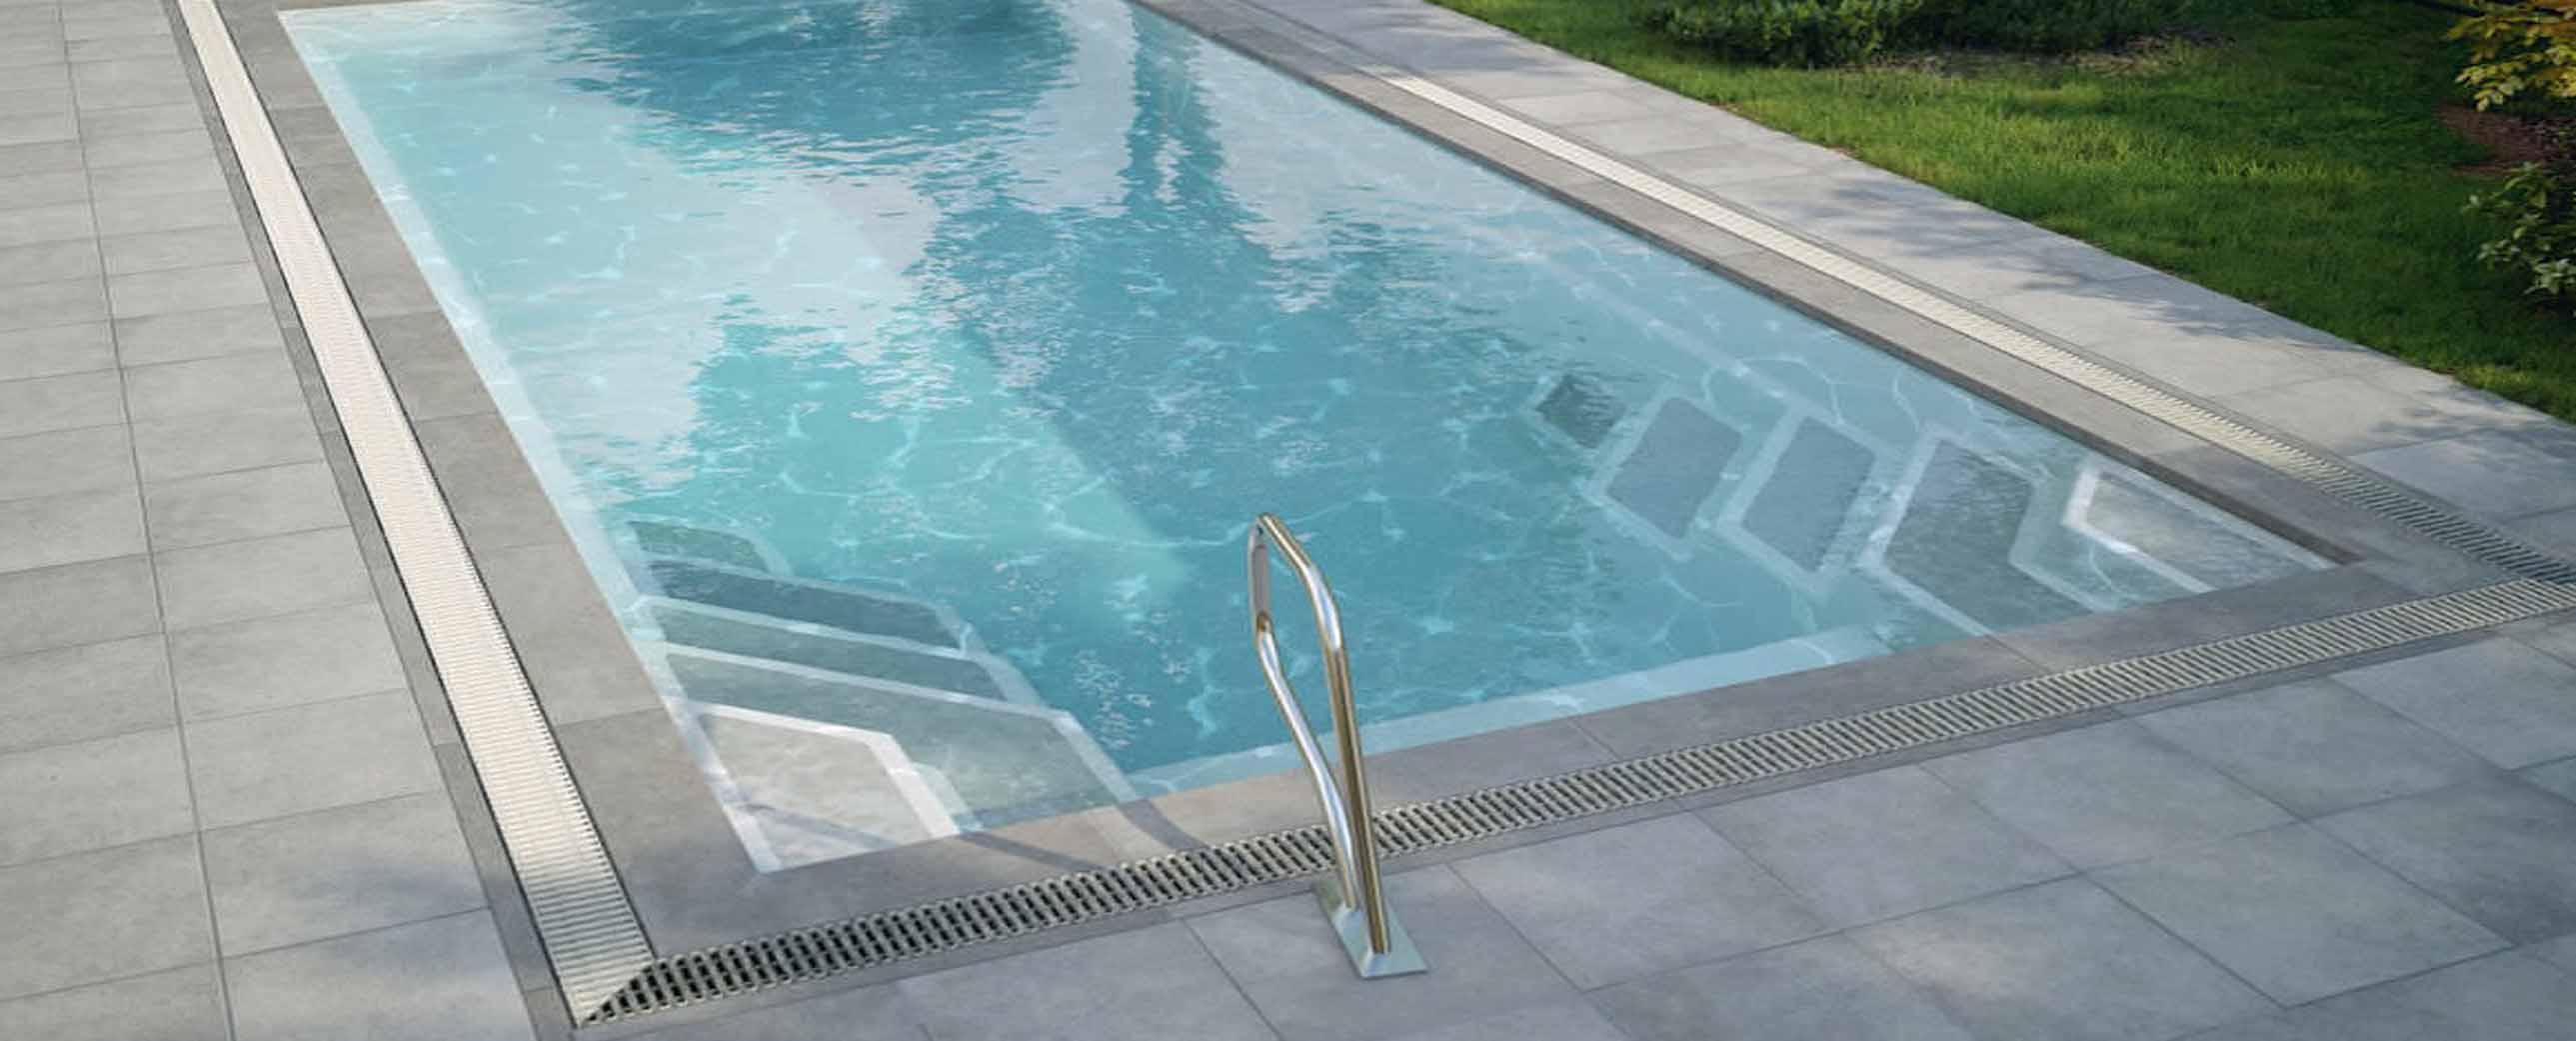 Instalaci n de piscinas de poli ster cubriland for Piscina poliester